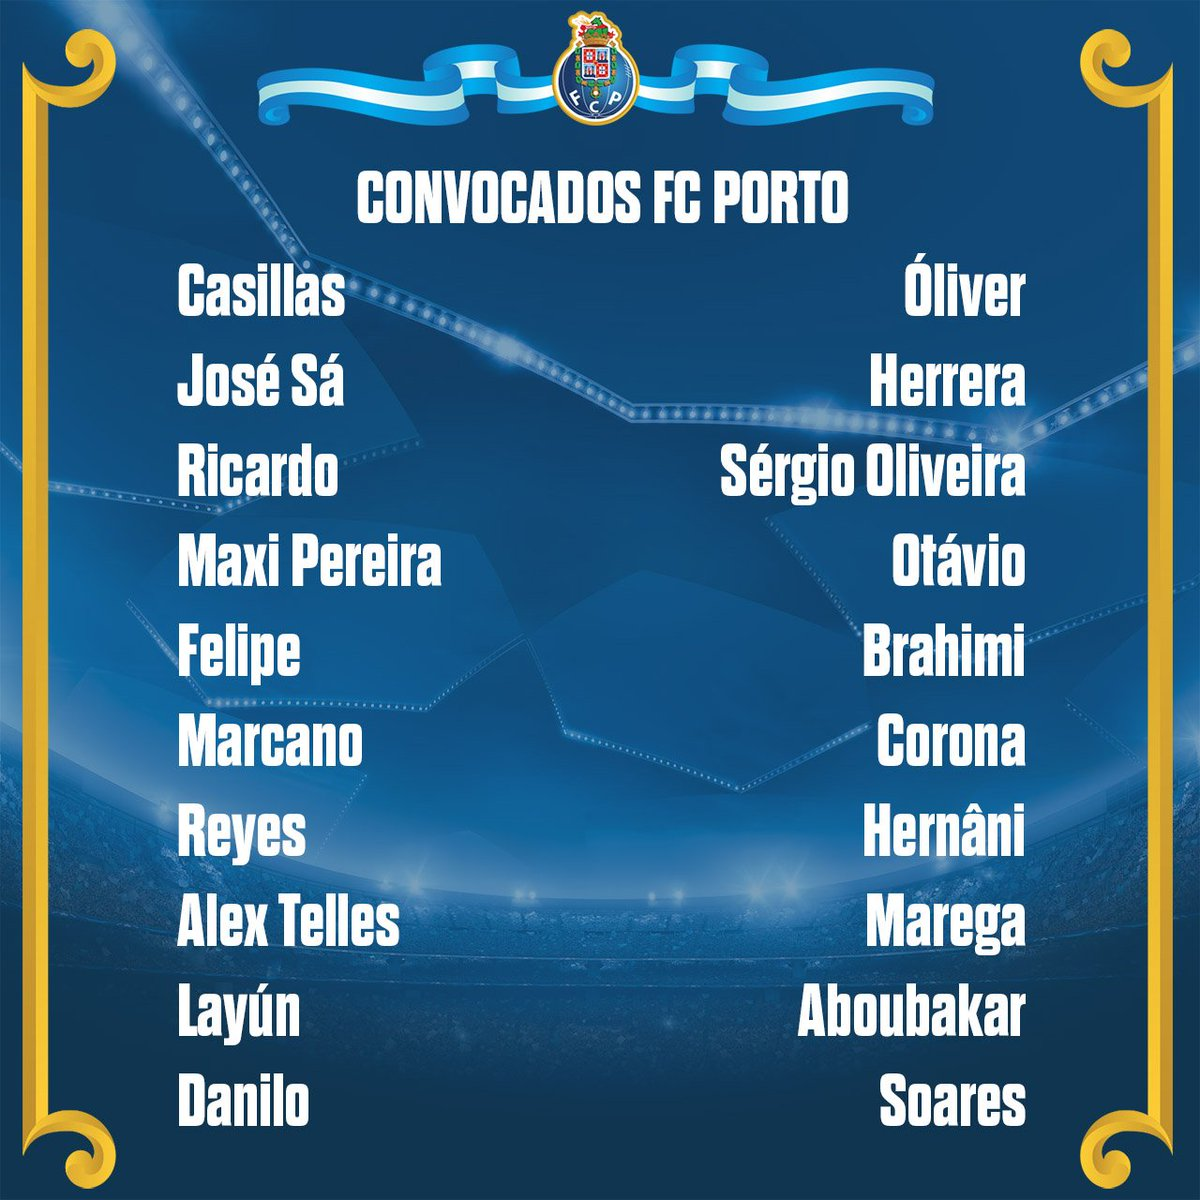 Groupe Porto